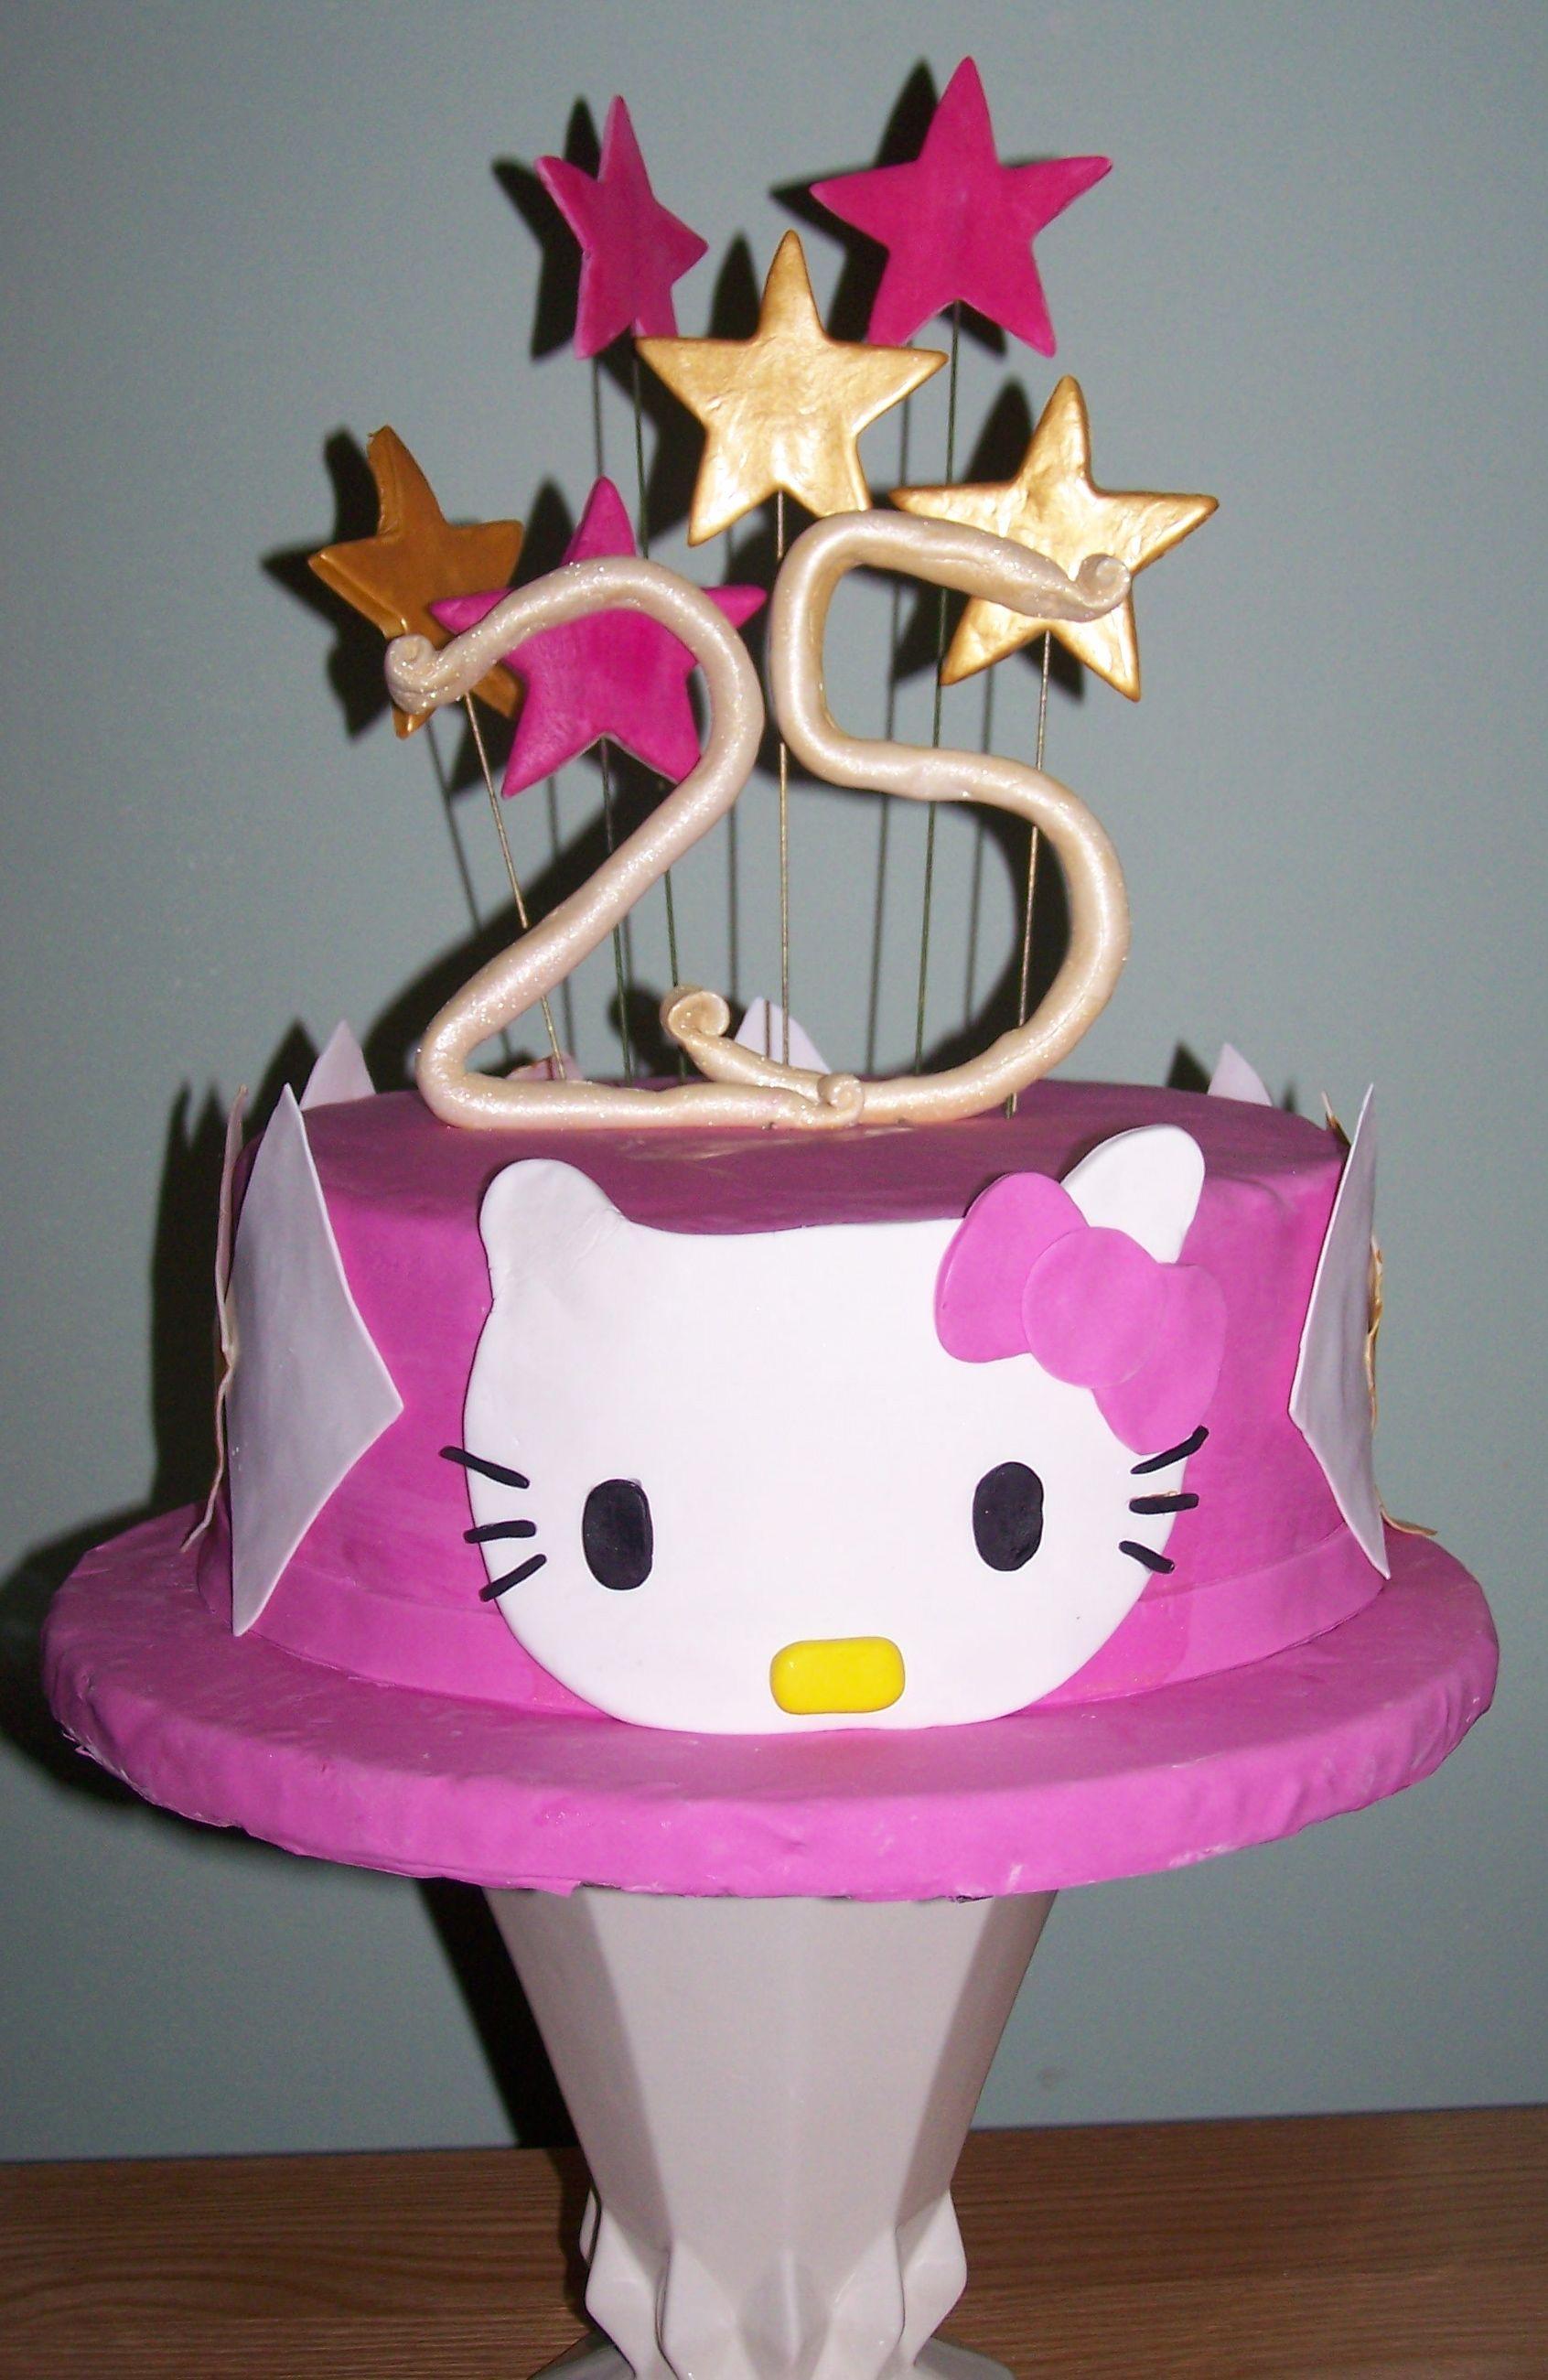 Happy Birthday Cake 25 Years Old